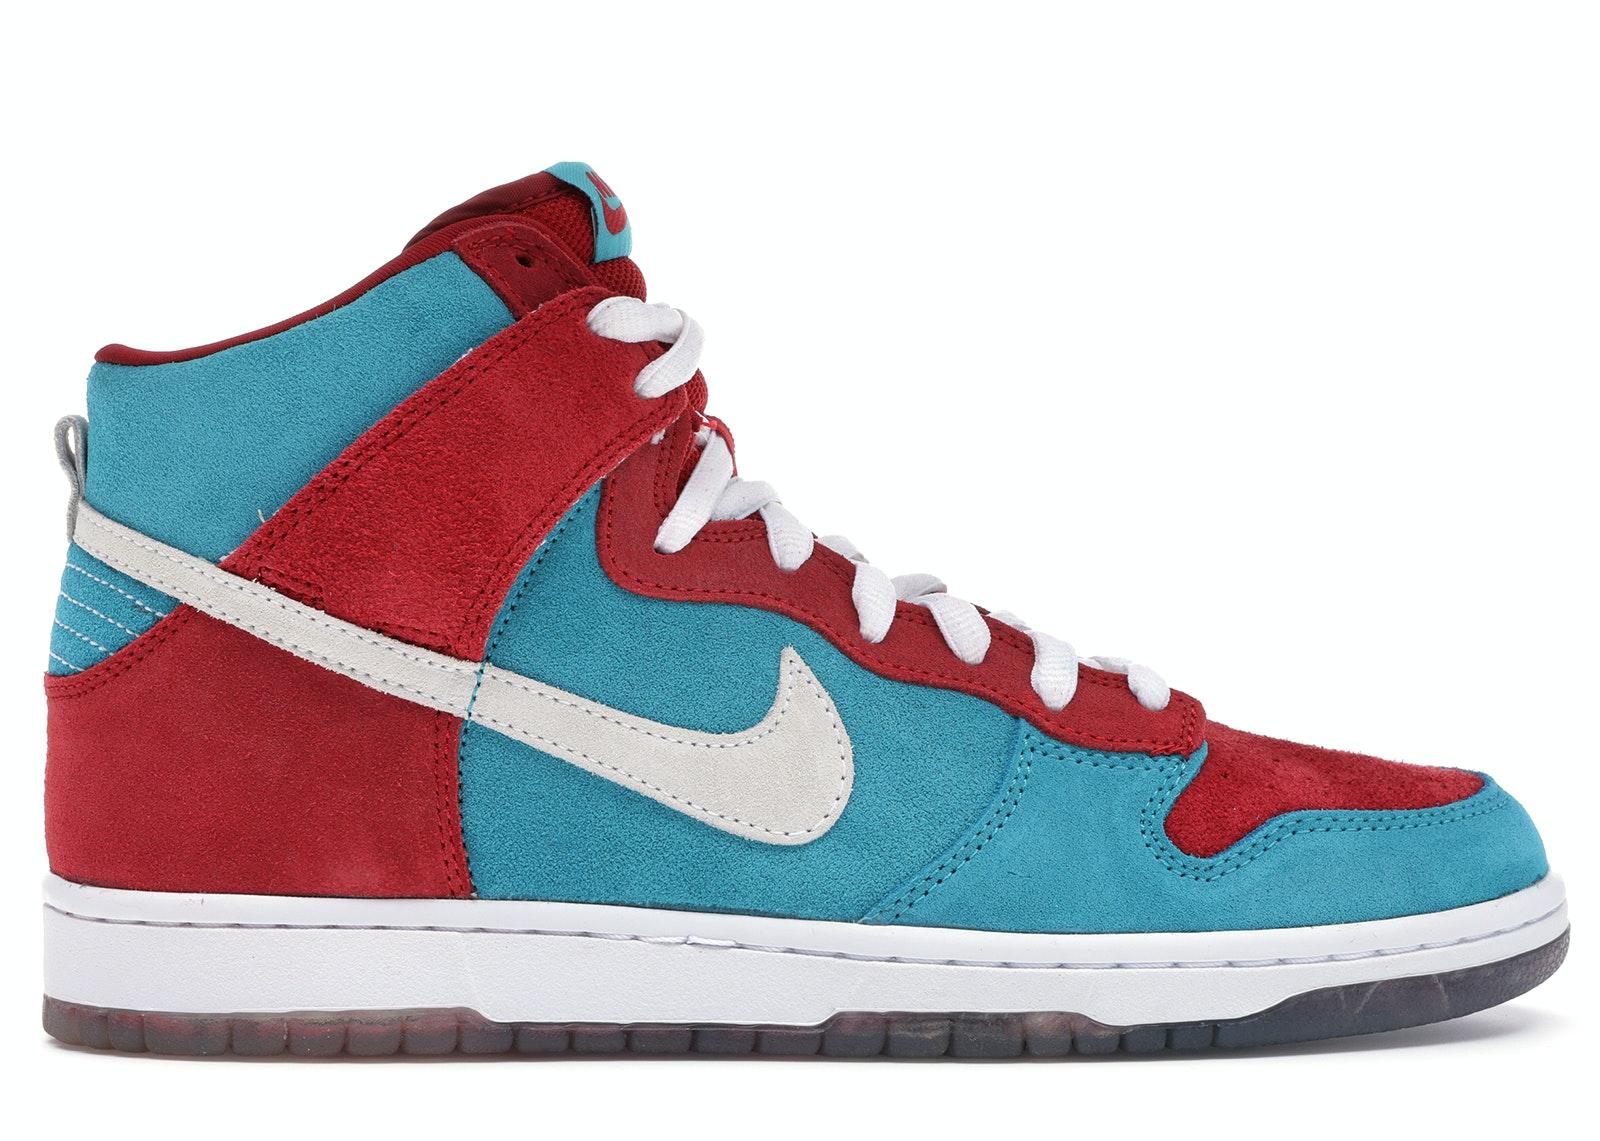 Nike SB Dunk High Bloody Gums